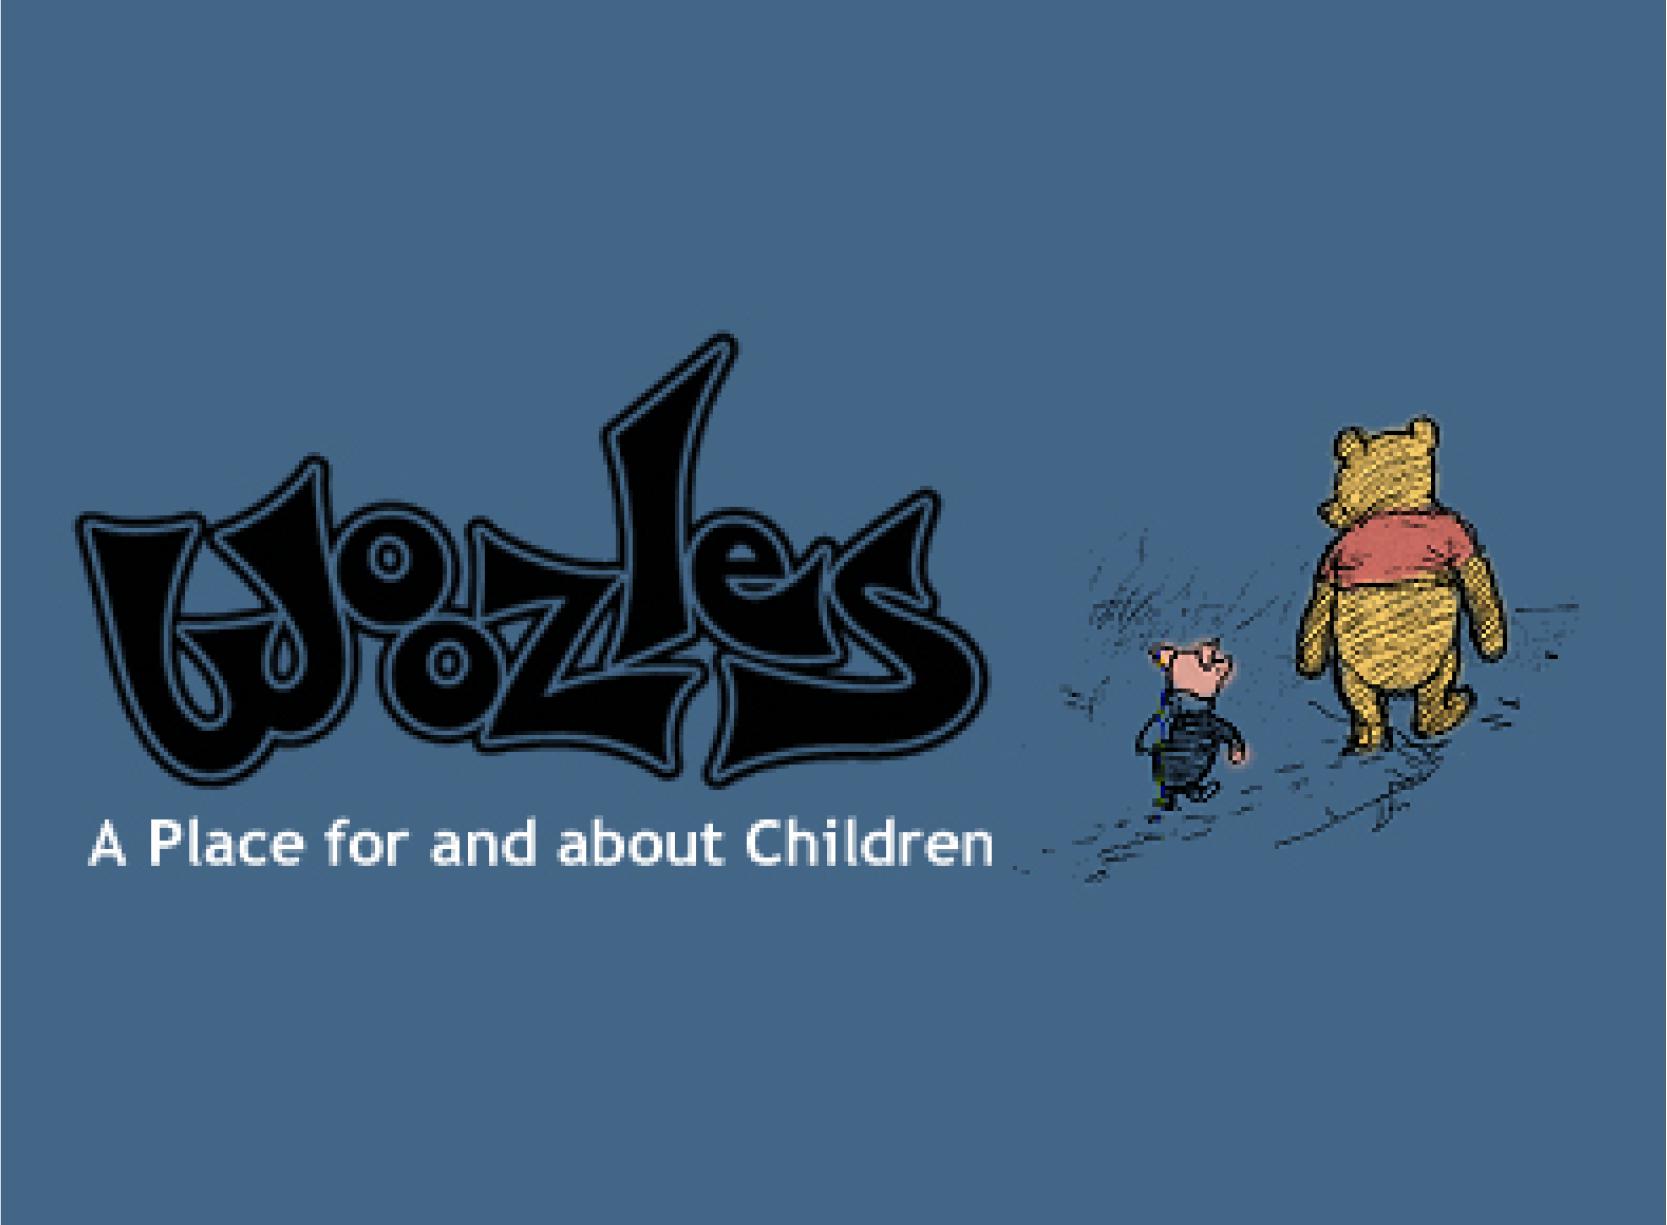 UsborneMonth-StoreLogos-Woozles